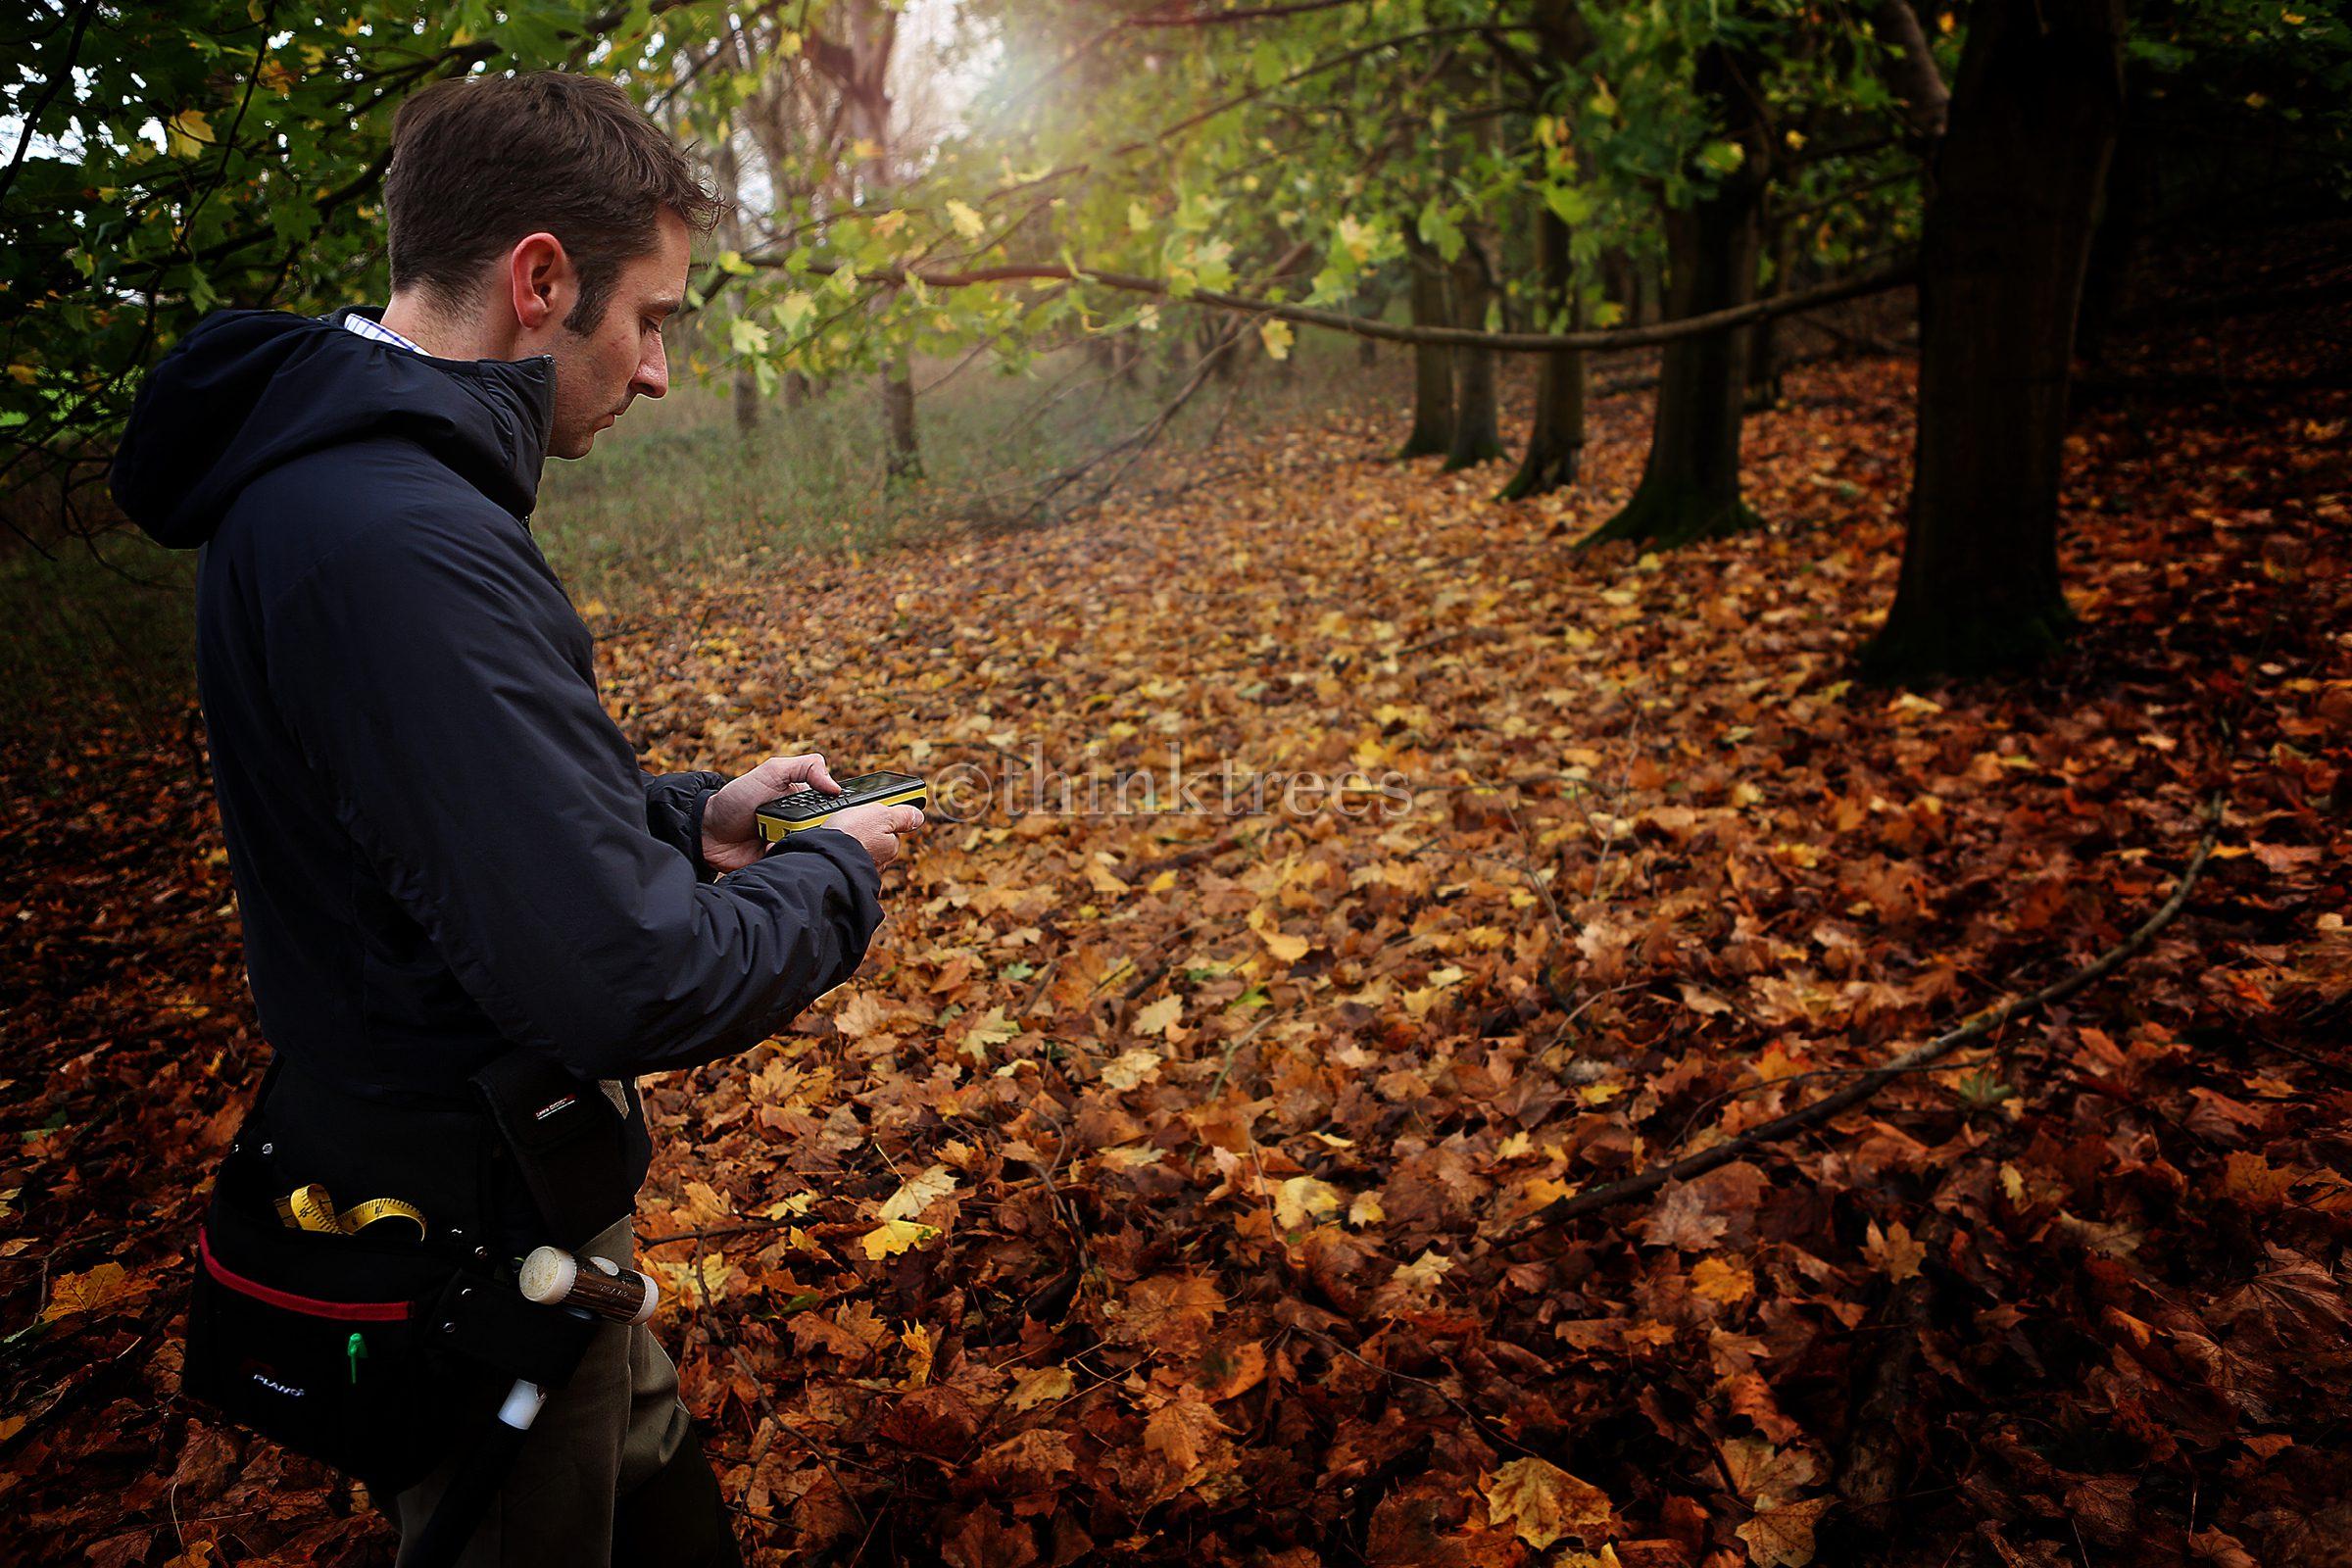 Tree surveyor measuring Tree dimensions using a leica disto d8 laser measure